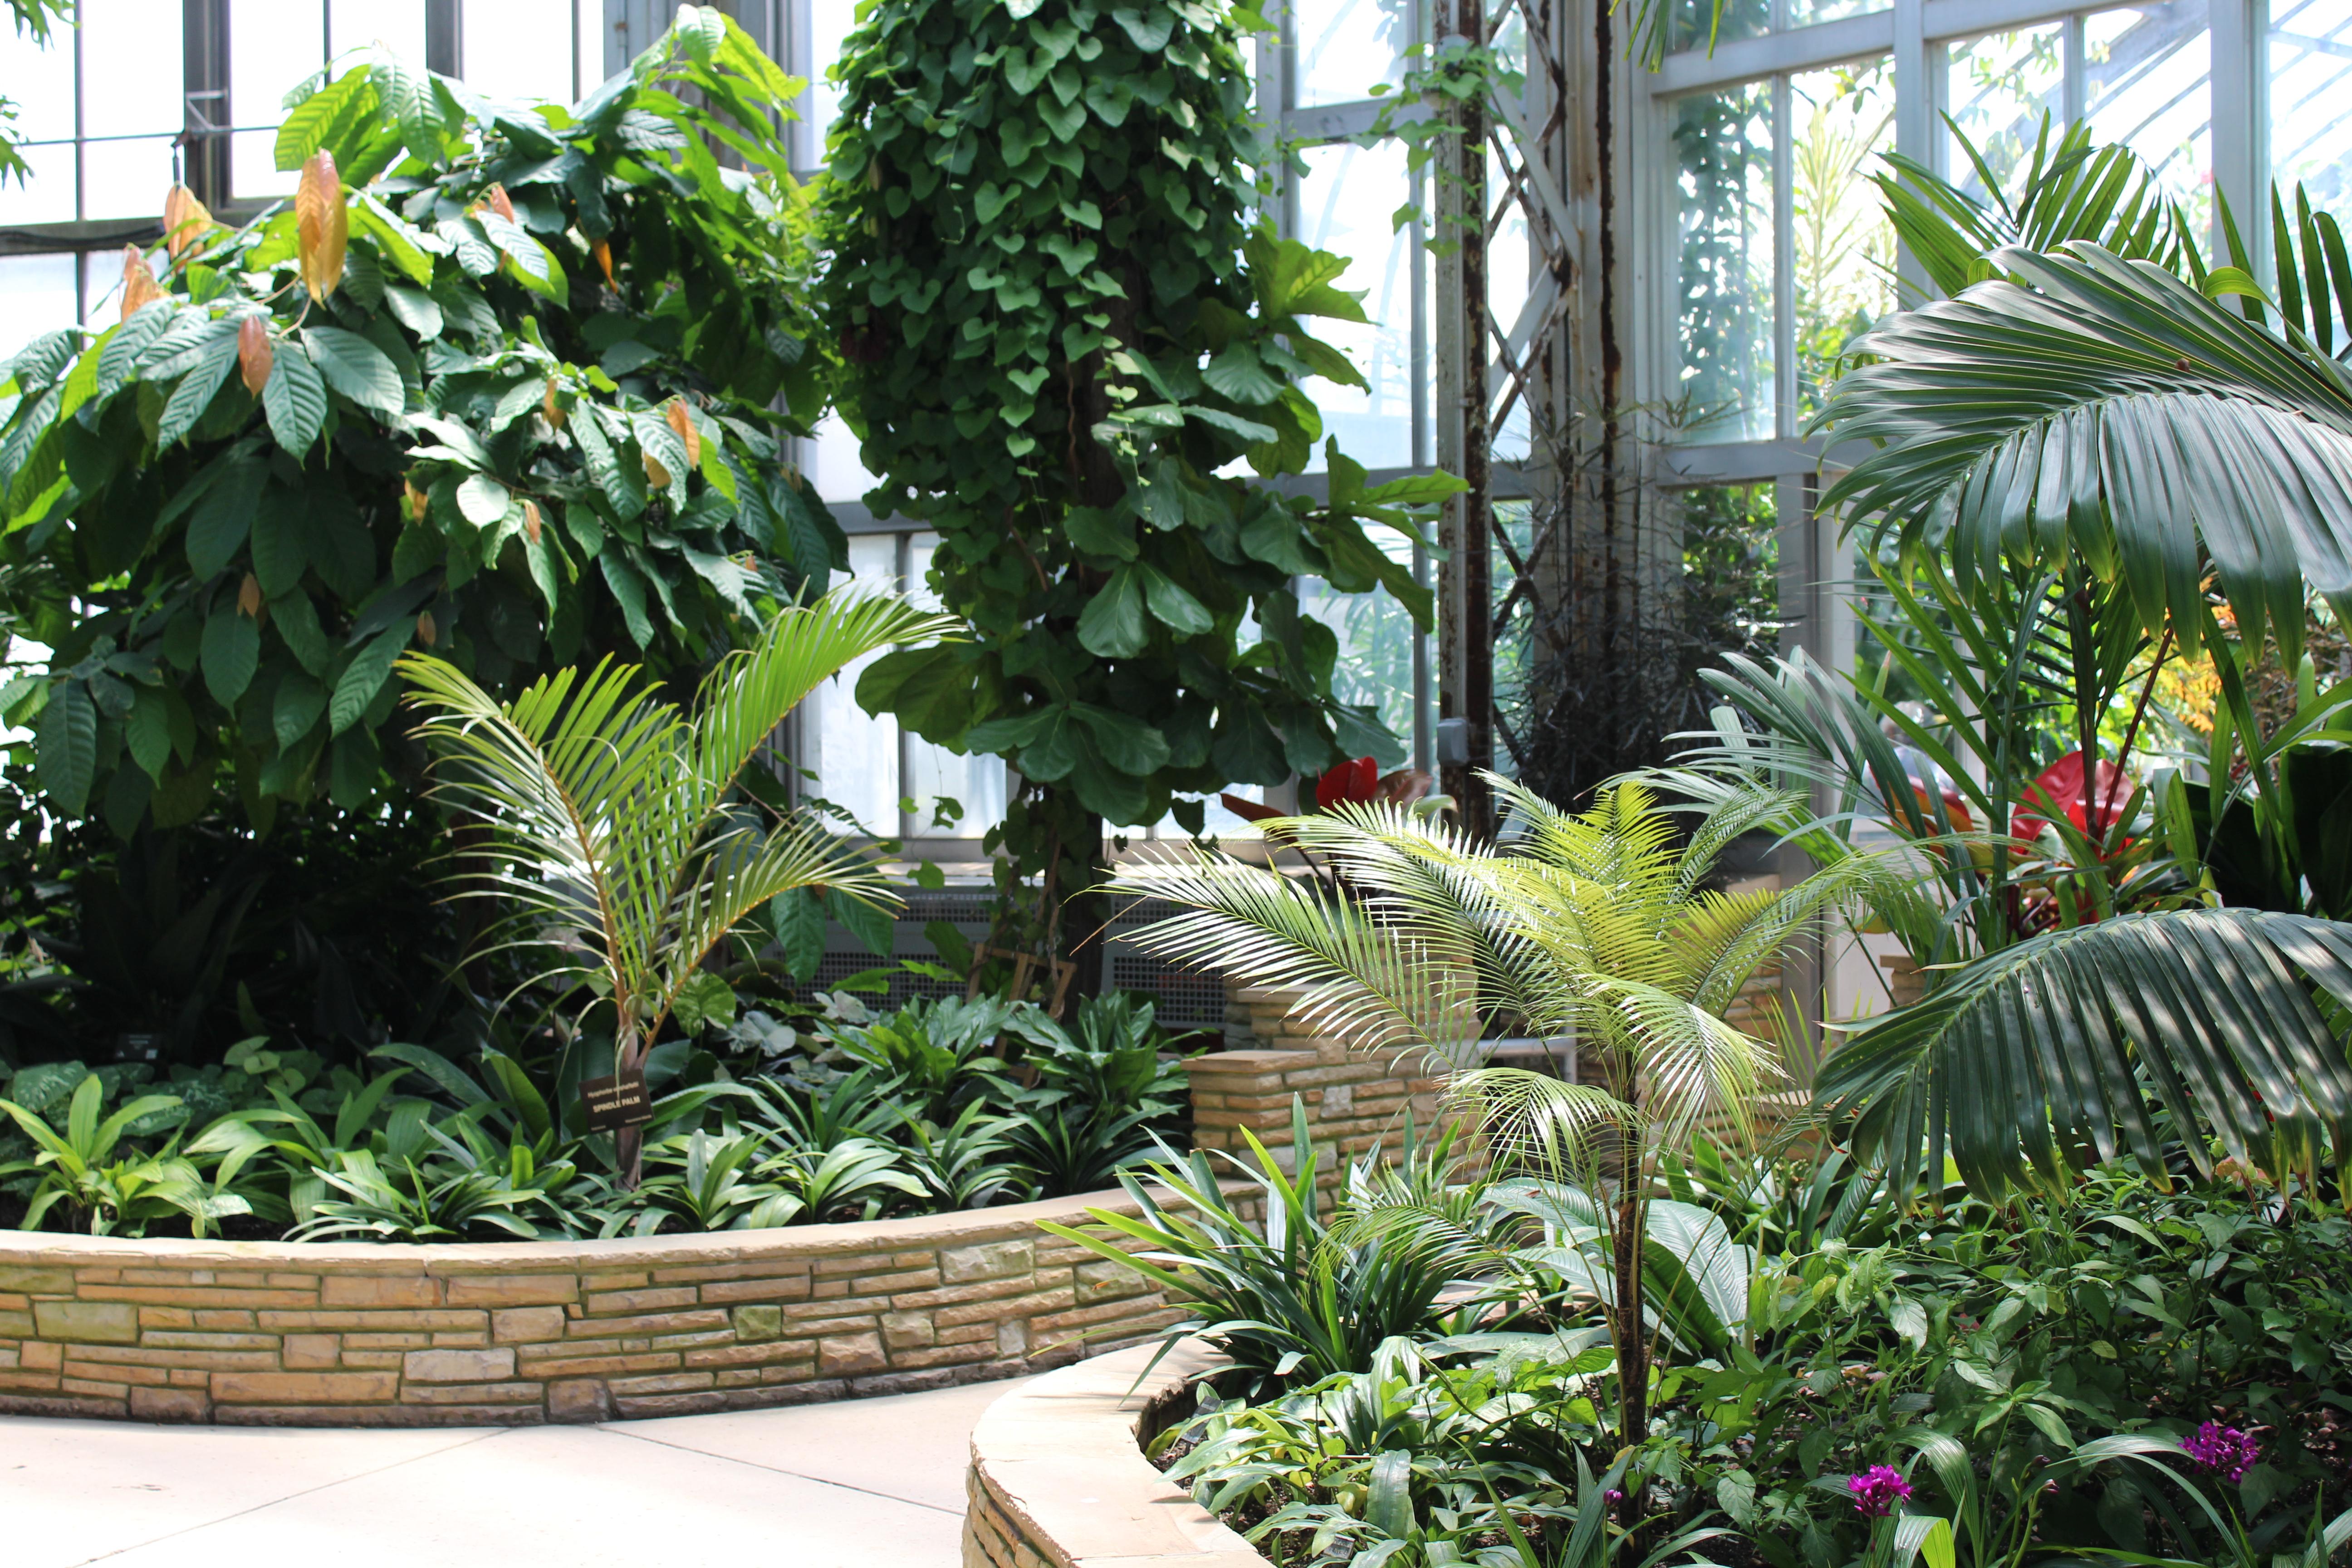 Tropical garden inside Belle Isle Conservatory